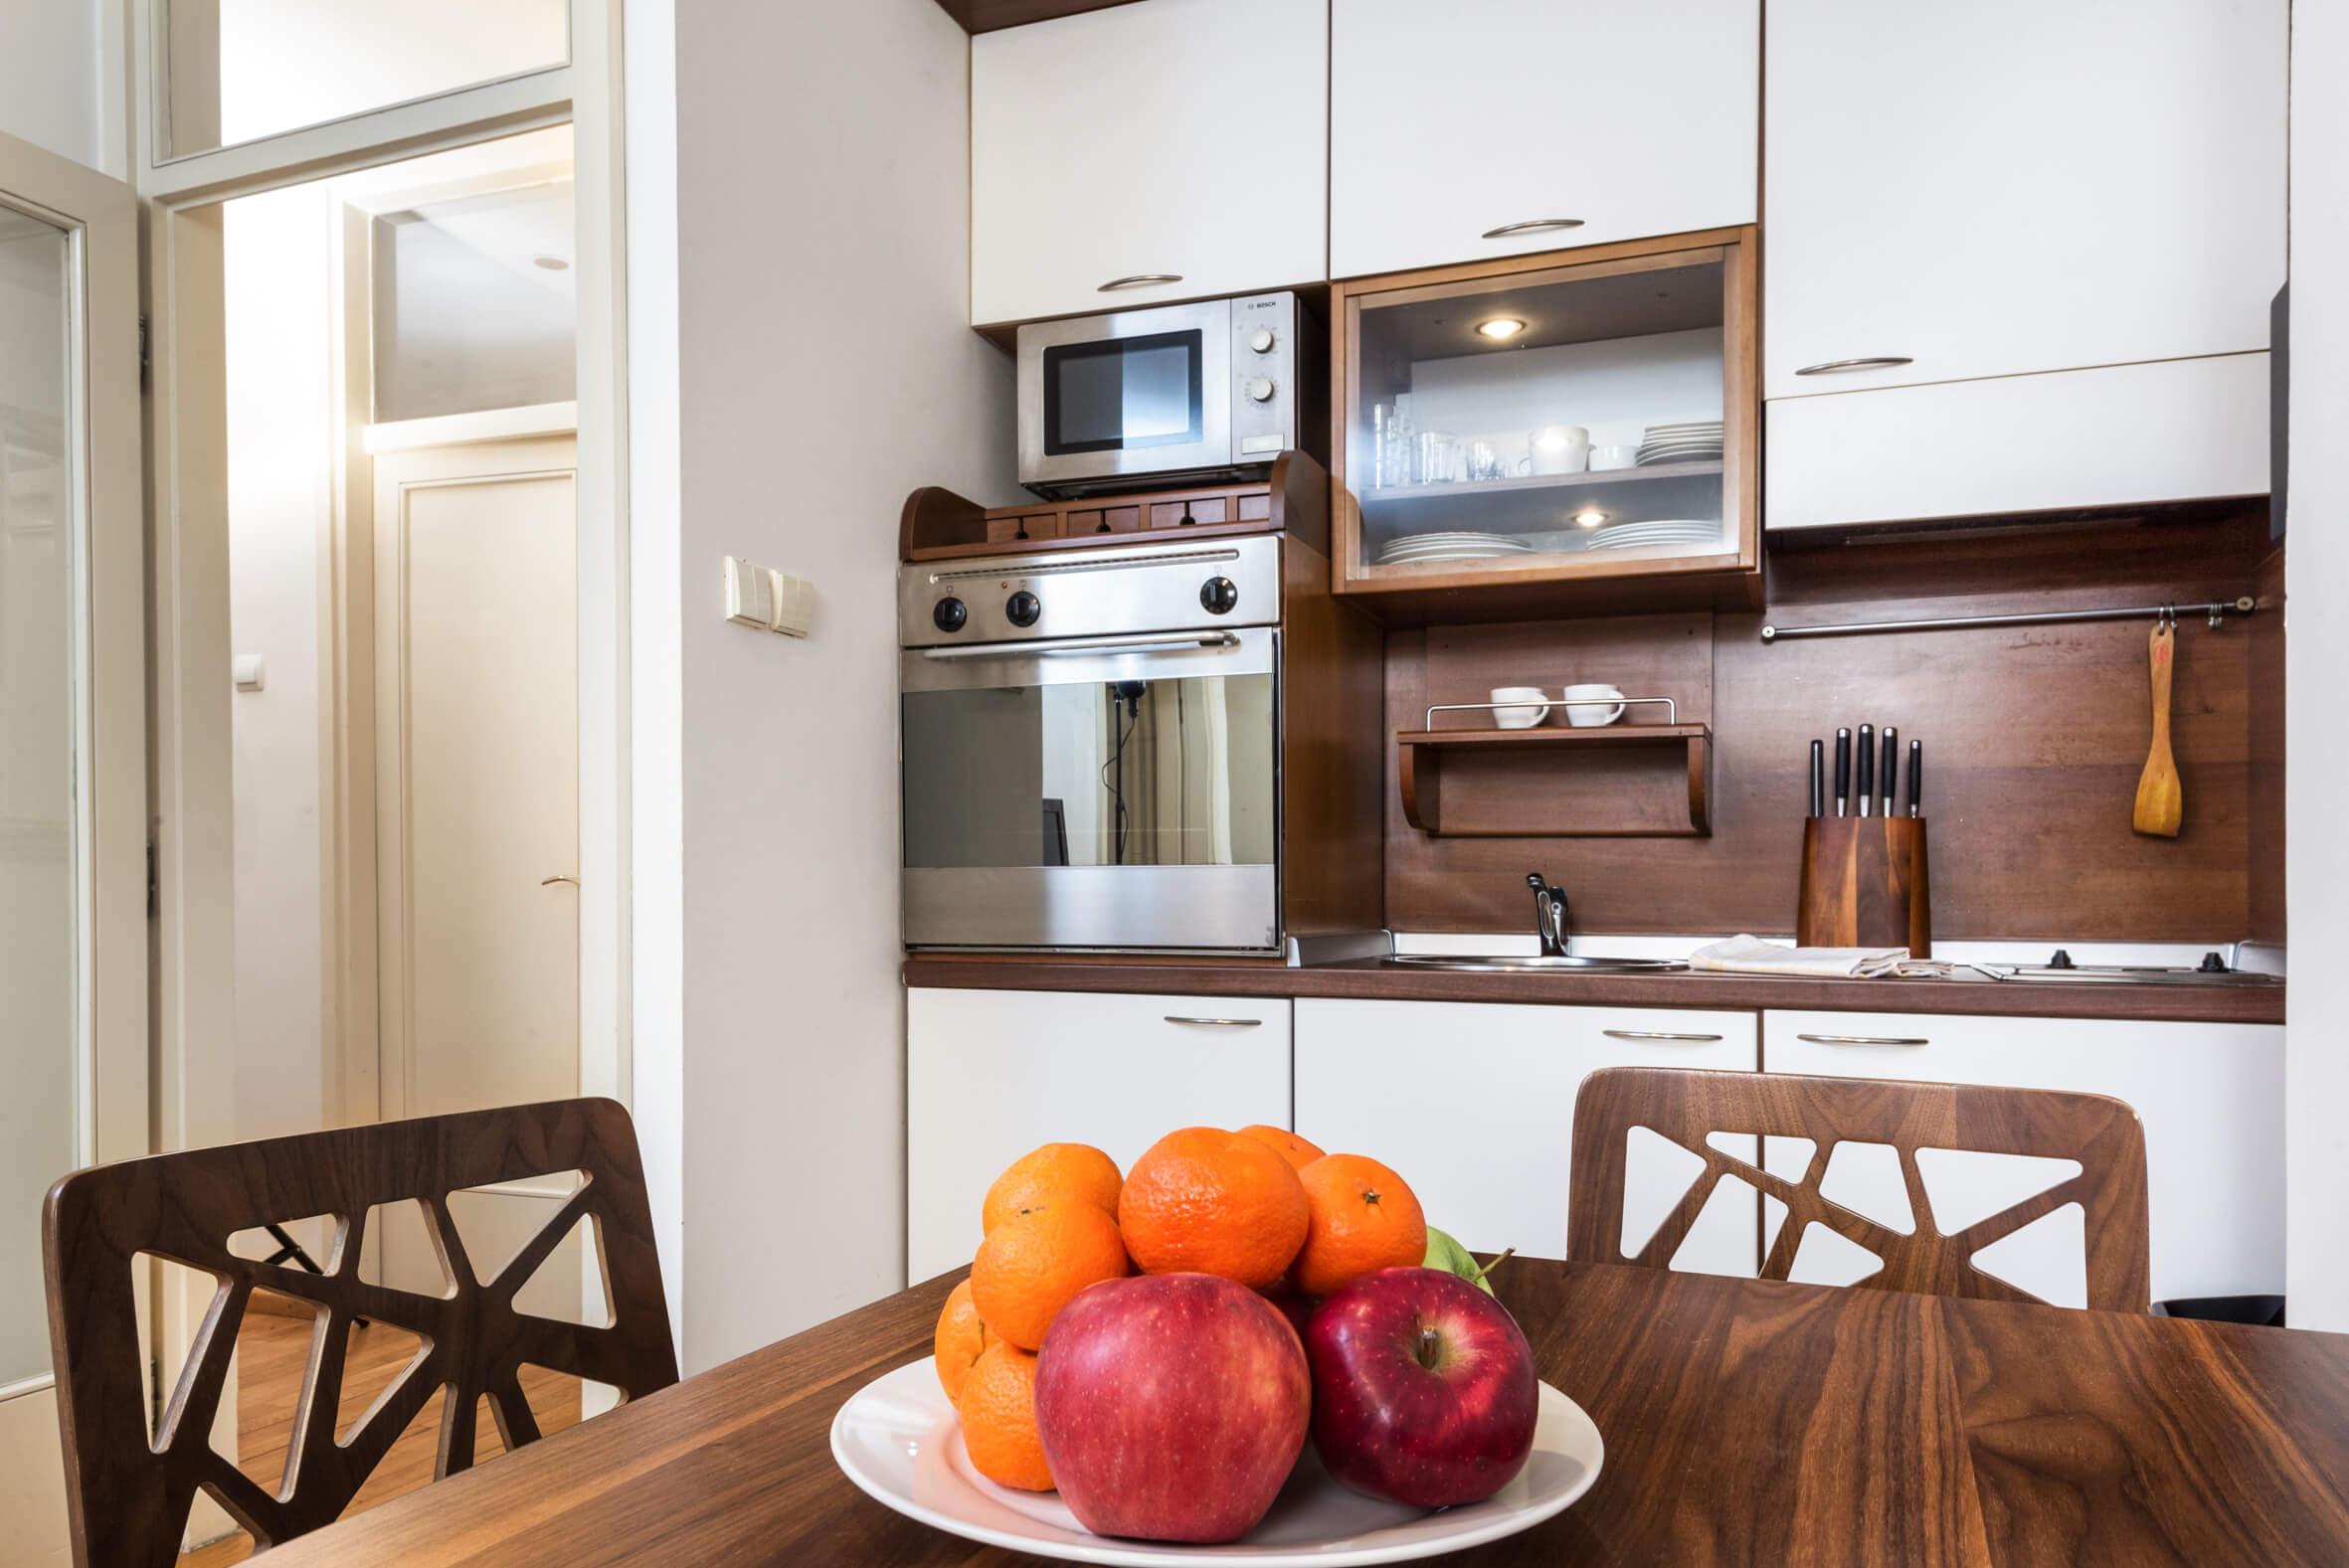 Apartmani Beograd | Stan na dan Beograd centar | Apartman A25 - Kuhinja